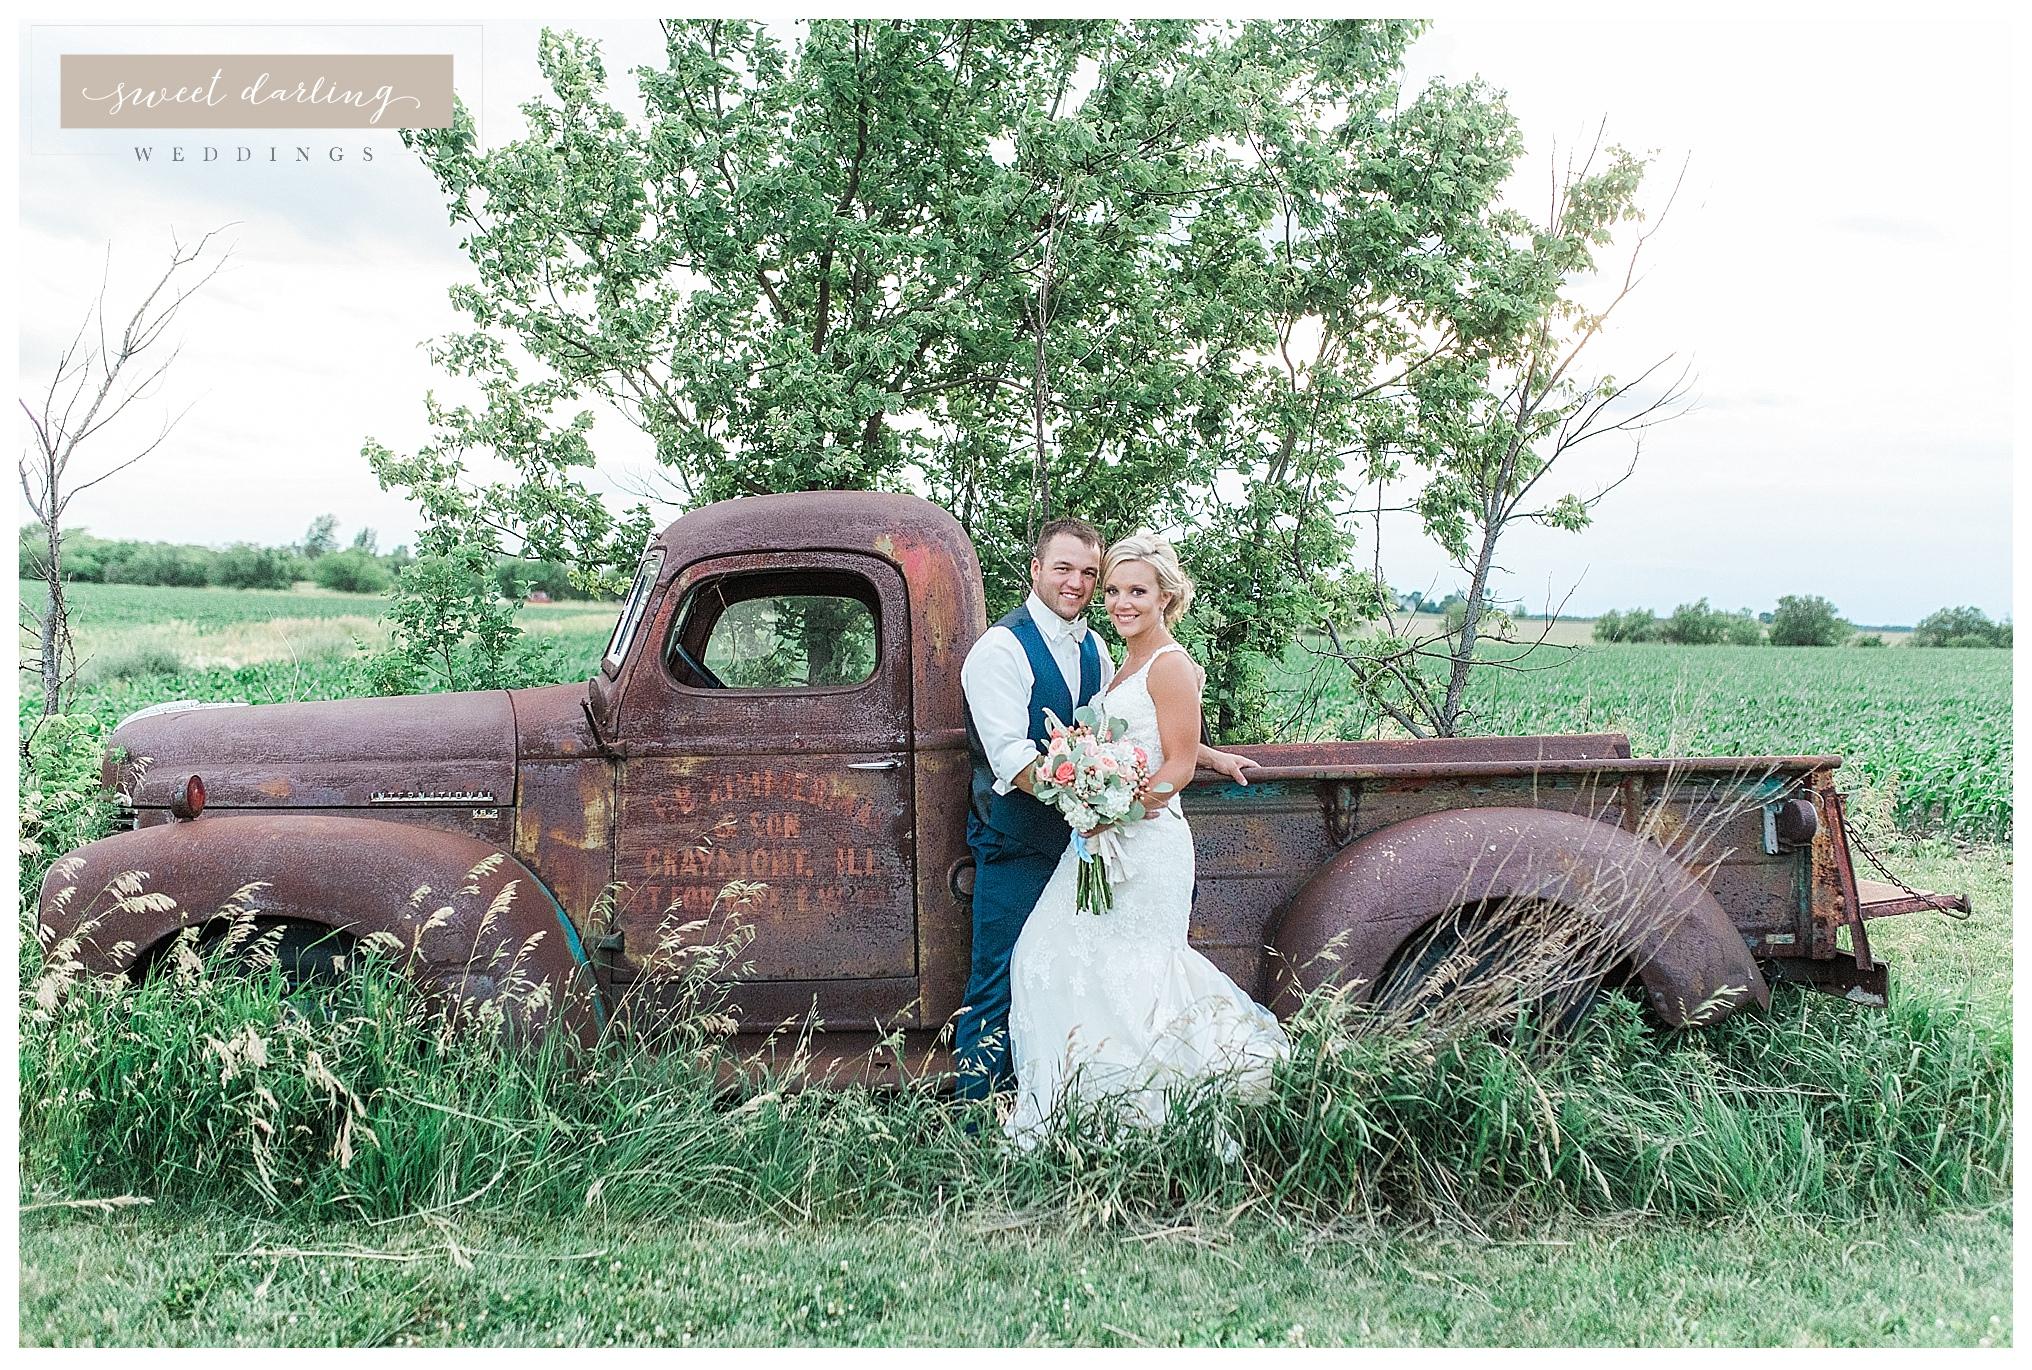 Rpaxton-illinois-engelbrecht-farm-country-wedding-photographer-sweet-darling-weddings_1271.jpg